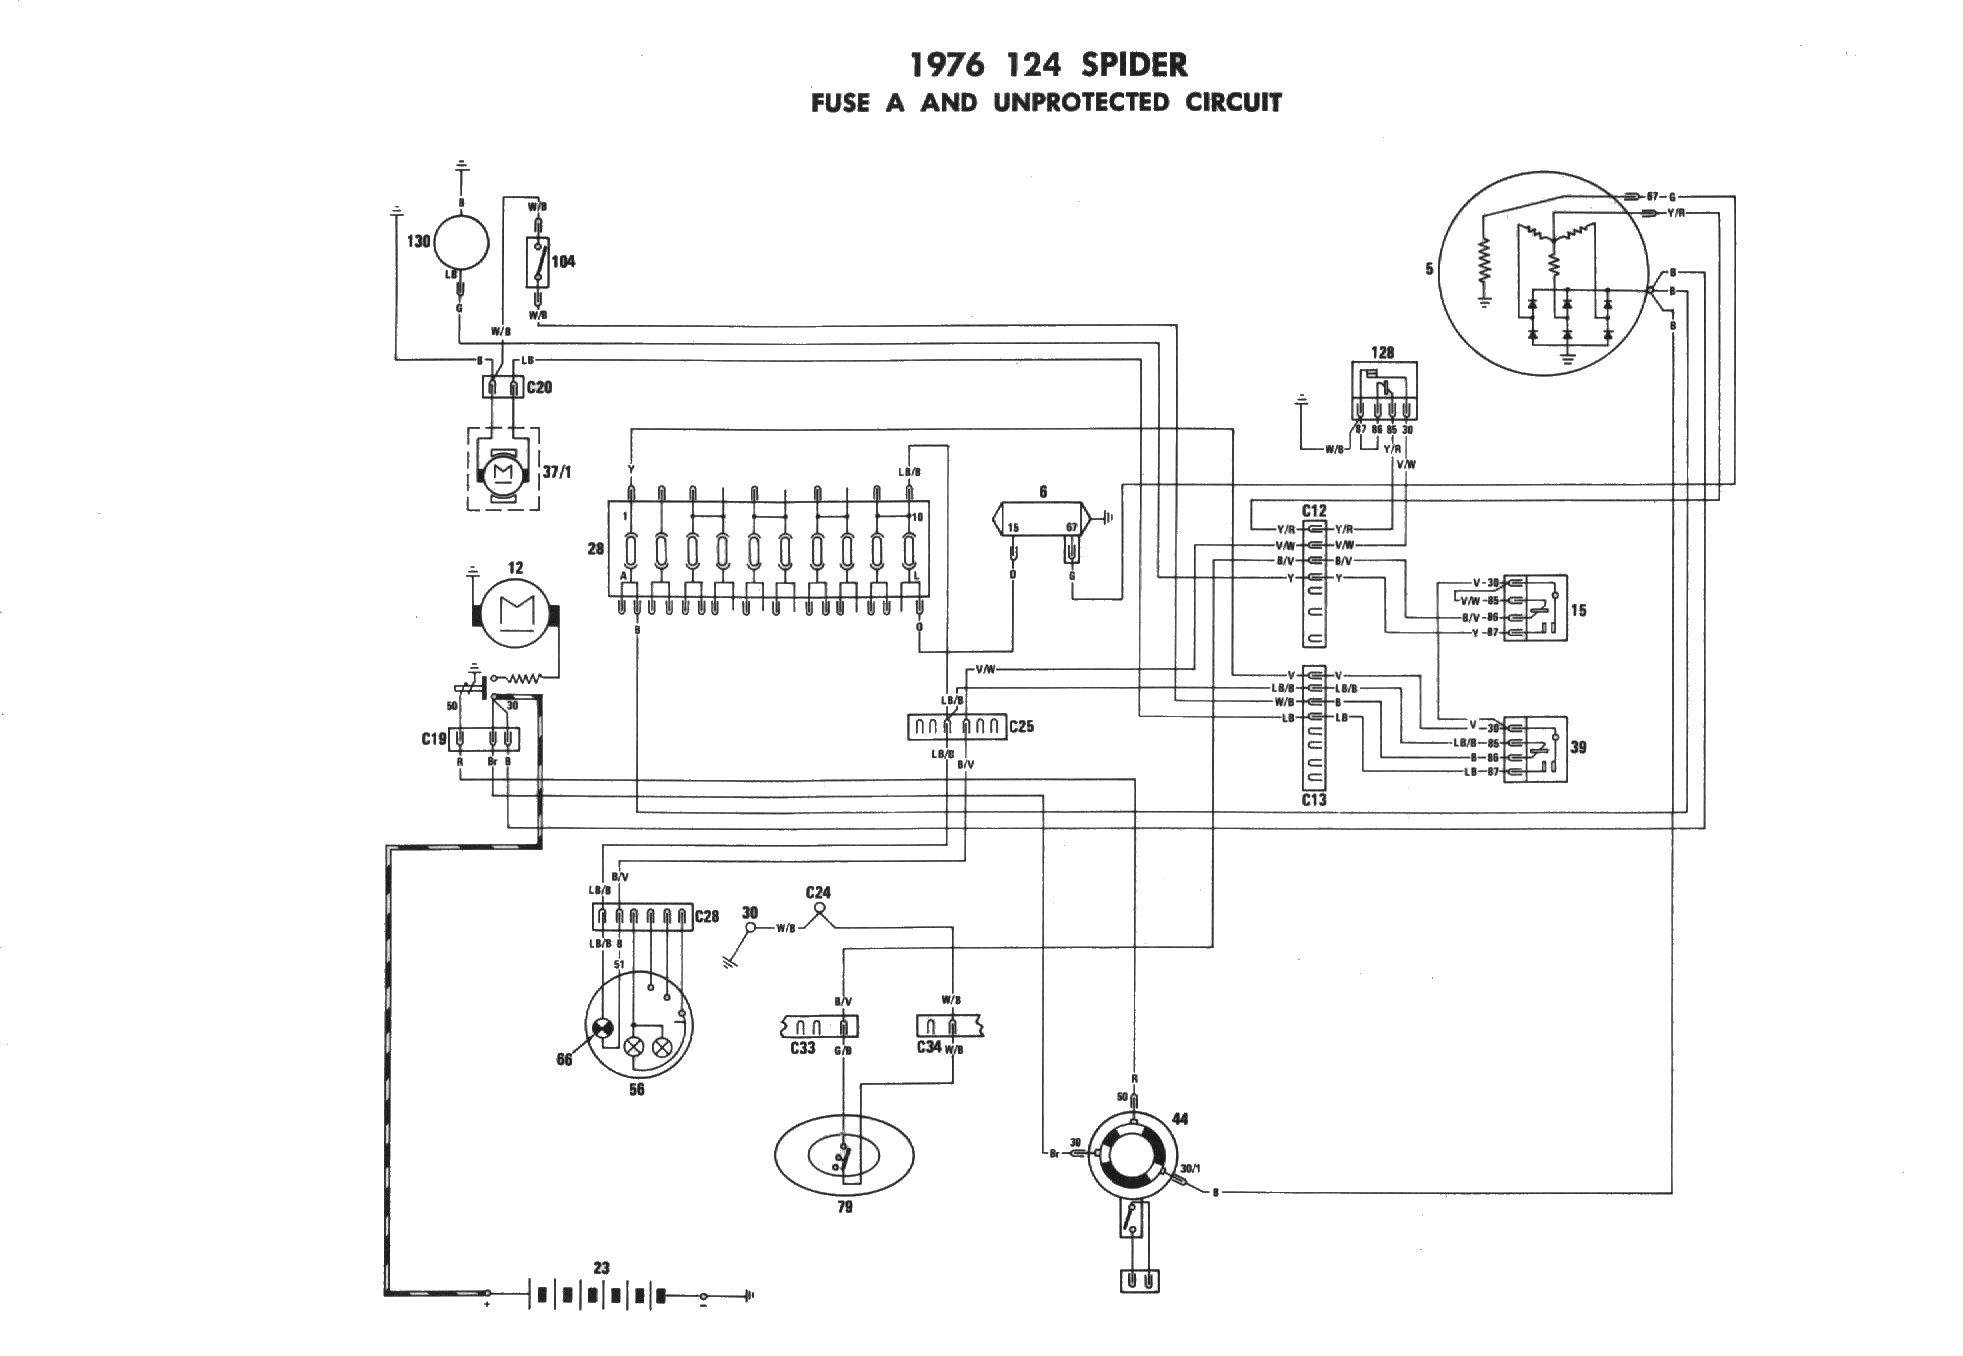 OH_3849] Light Wiring Diagram In Addition 1974 Fiat 124 Spider Convertible  Free DiagramPila Greas Feren Inki Gue45 Mohammedshrine Librar Wiring 101